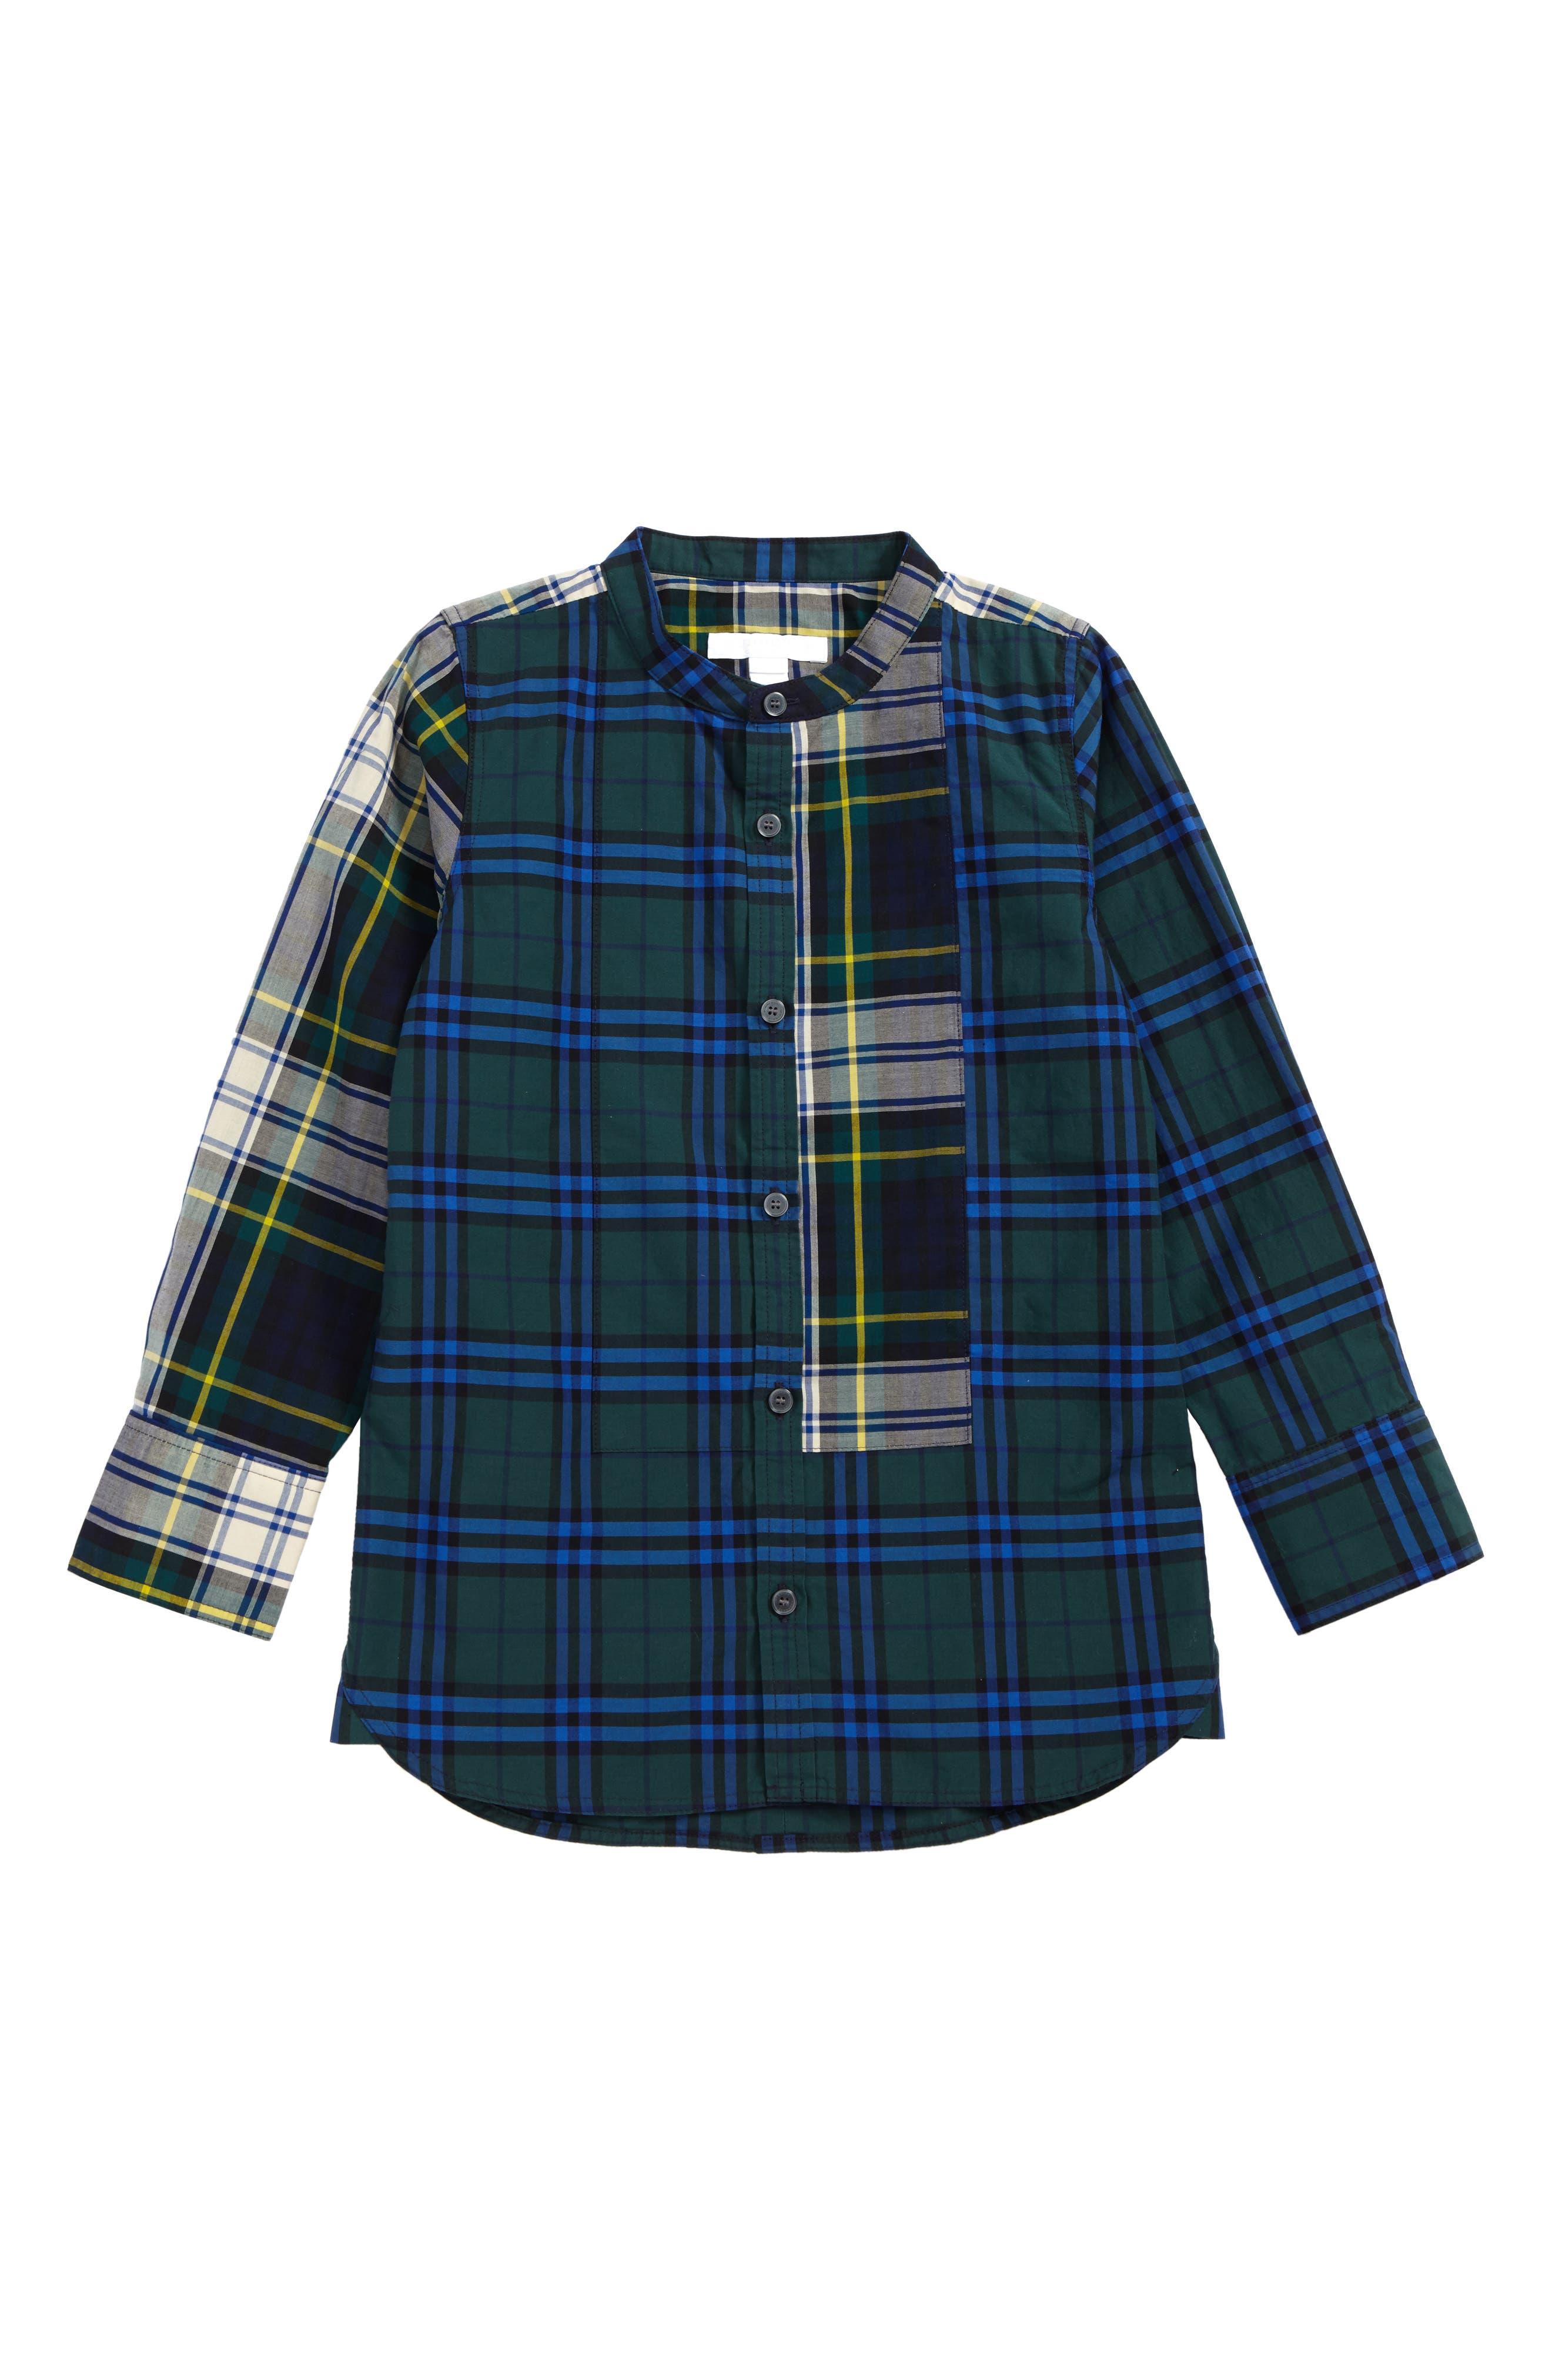 Main Image - Burberry Argus Check Print Woven Shirt (Little Boys & Big Boys)